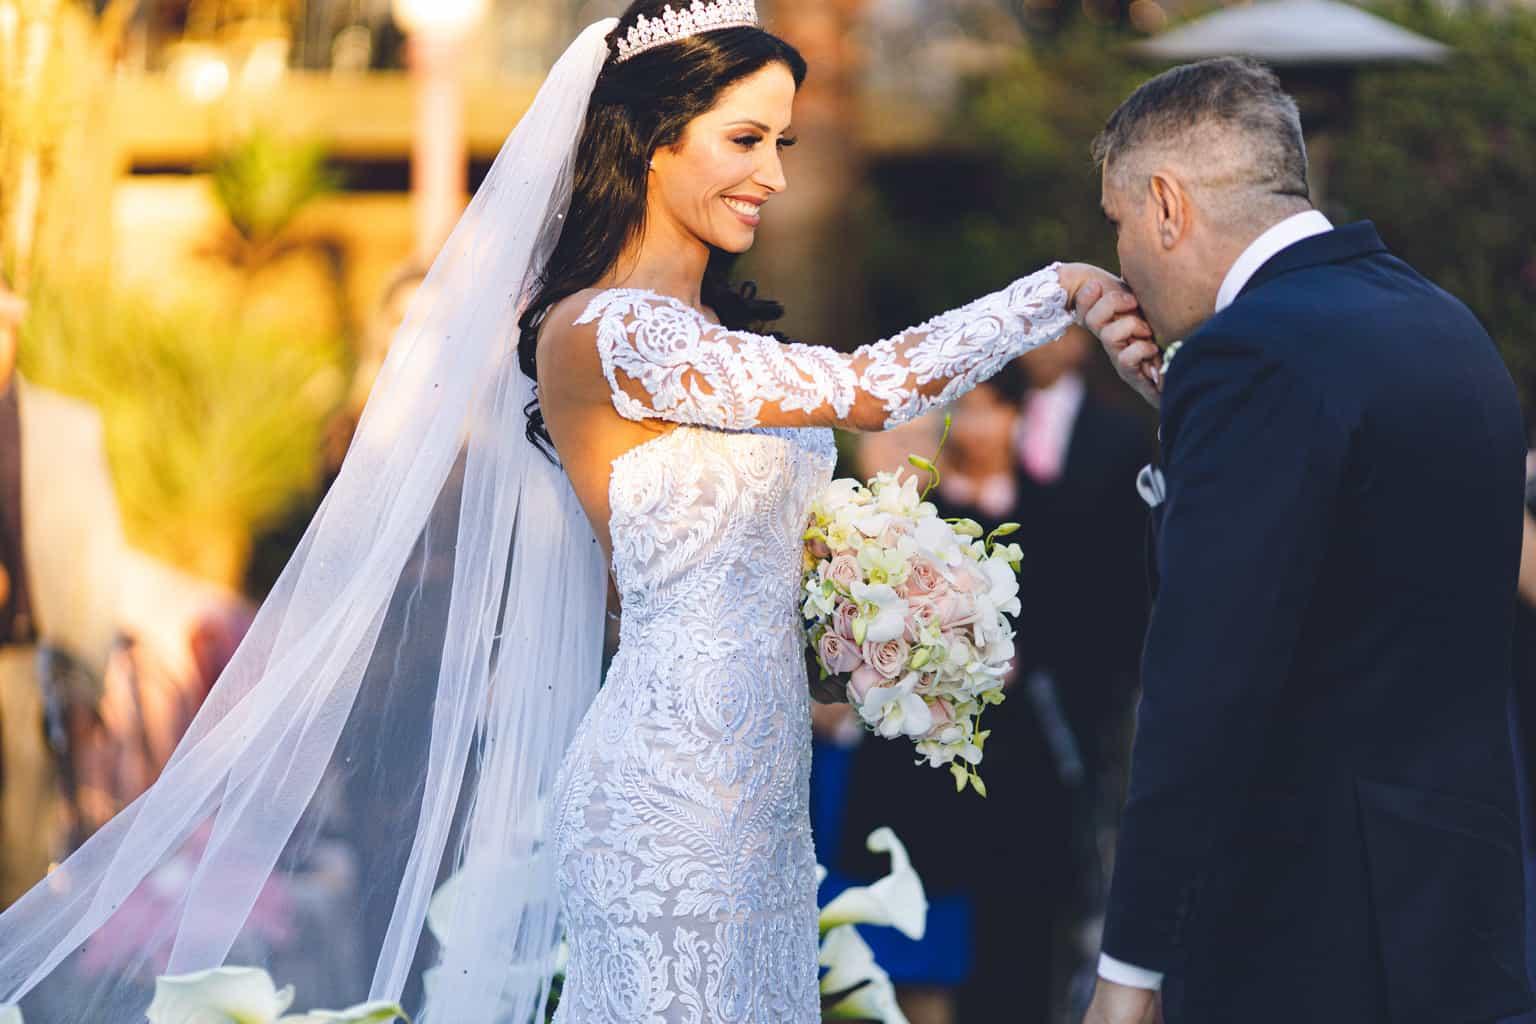 Casamento-de-Bianka-e-Nilo-Fotografia-Marcelo-Schmoeller-SC-Alameda-Casa-Rosa-03082019_bianka-e-nilo_1247